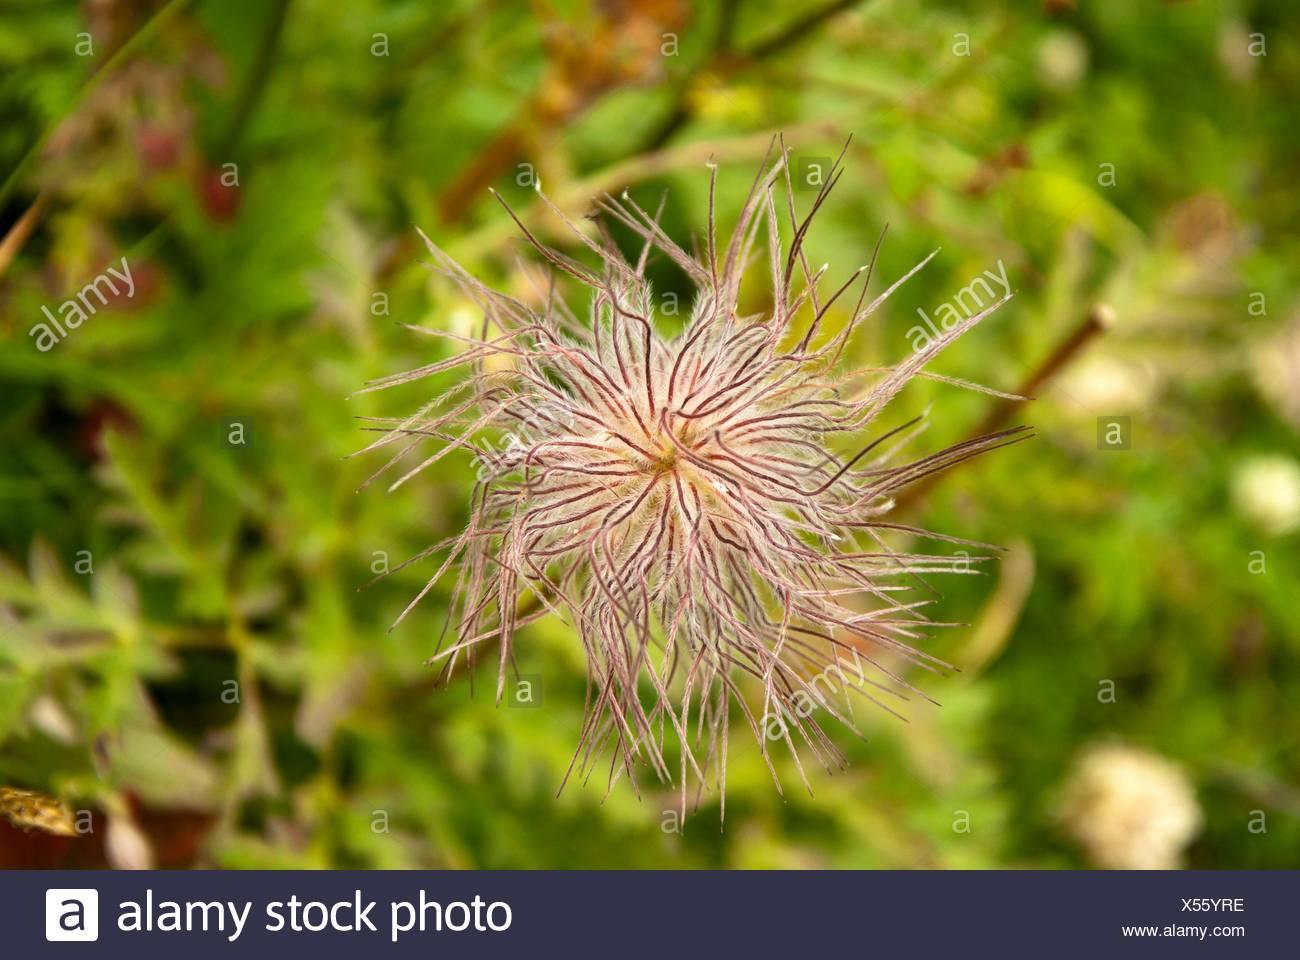 Tousled flower. Italian Alps. Dolomites area. Italy. - Stock Image